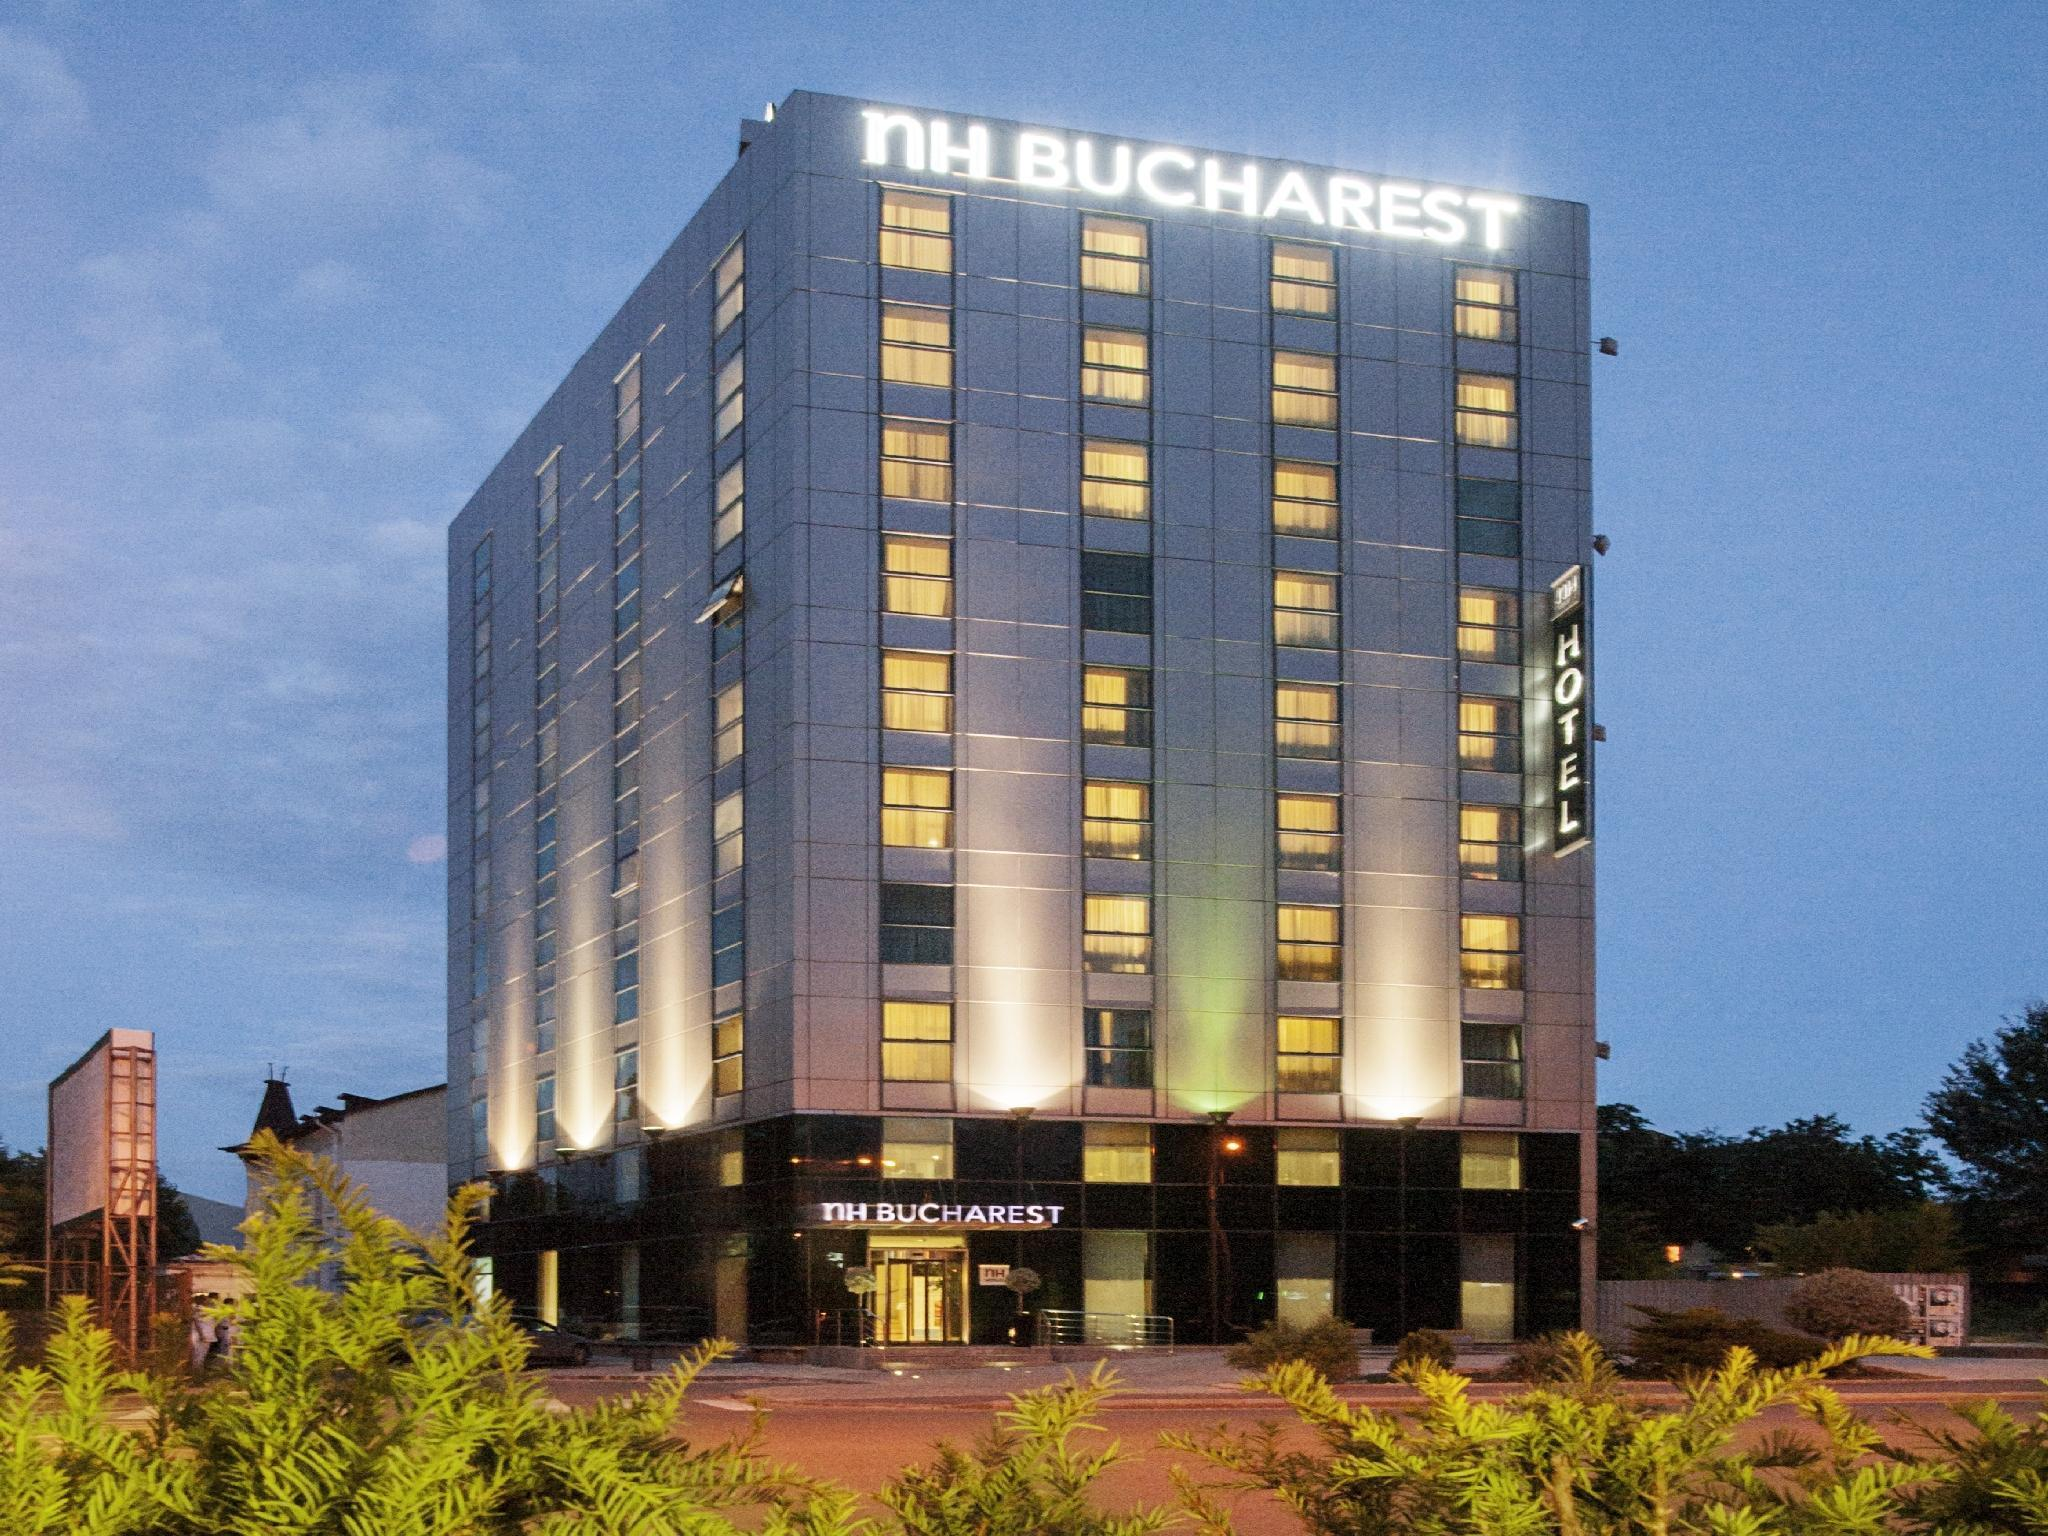 NH Bucharest